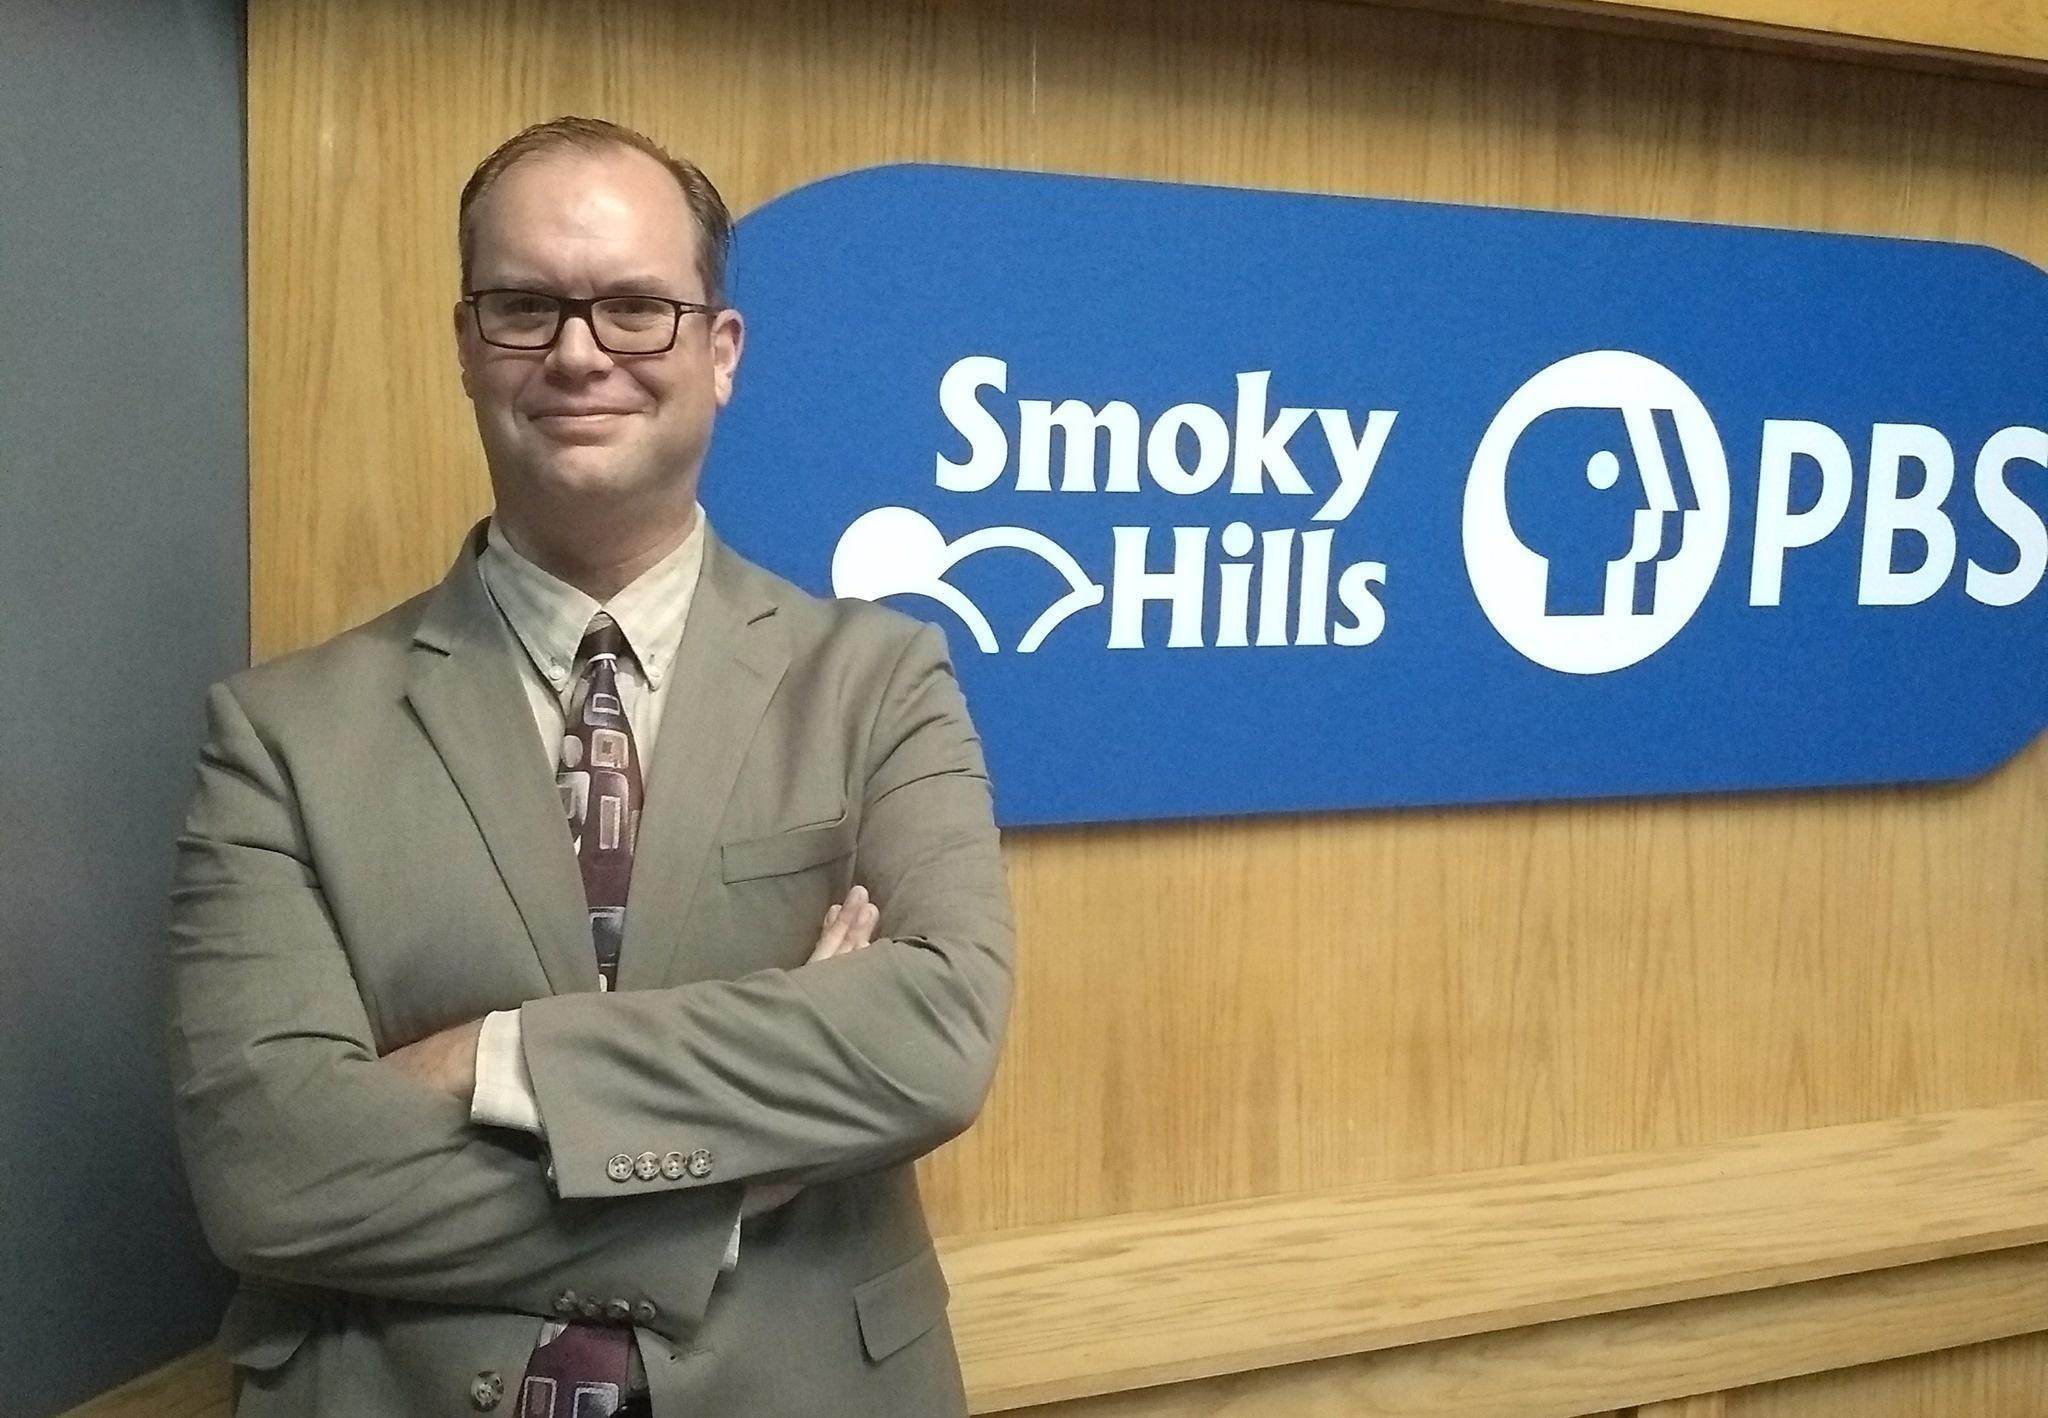 Travis Hendryx is new GM of Smoky Hills PBS